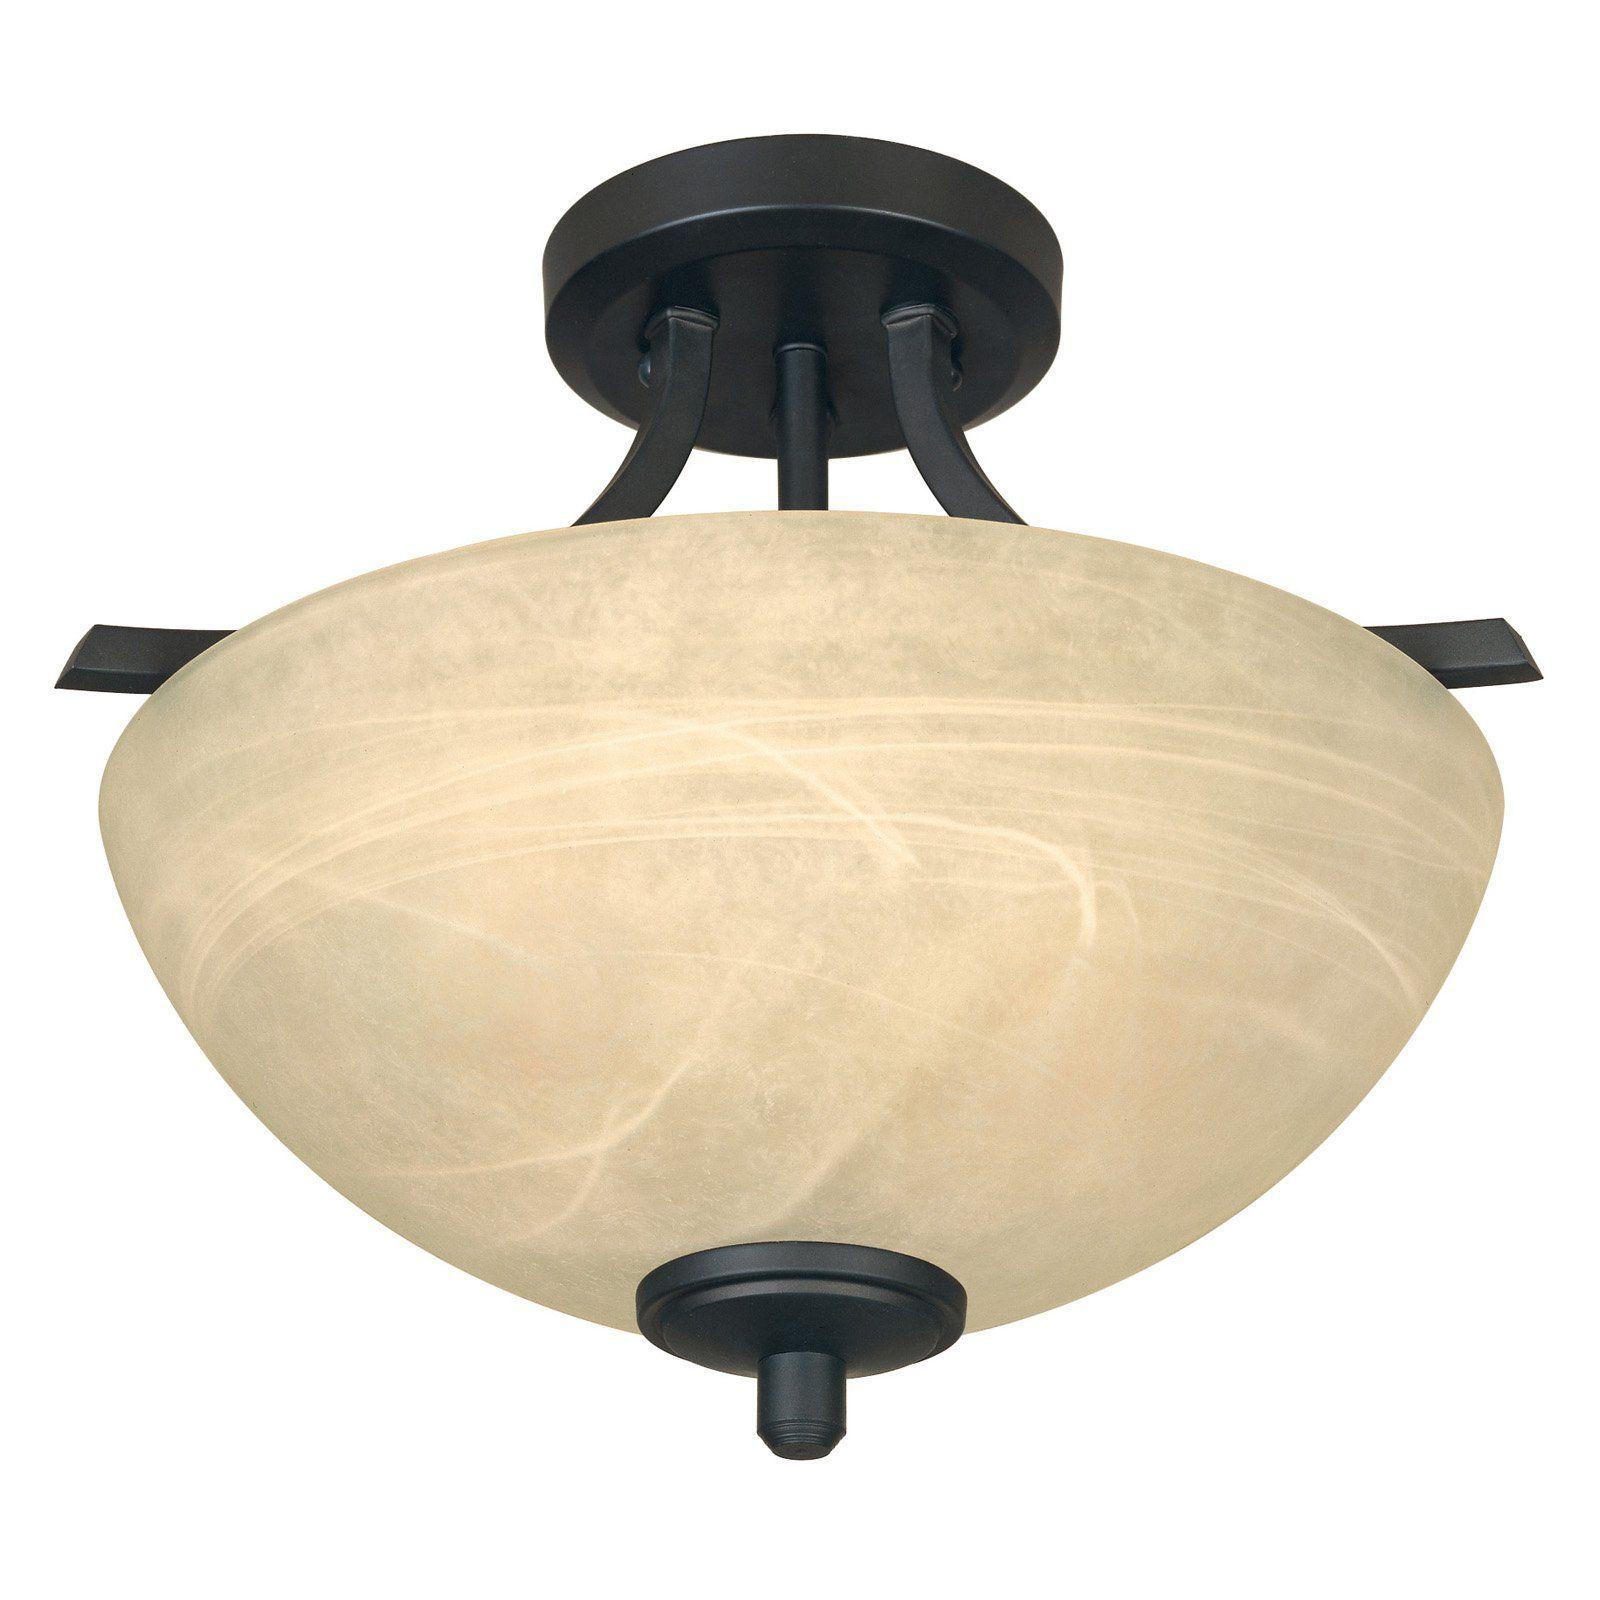 Designers Fountain 82911 Tackwood Semi Flush Light  82911 Bnb